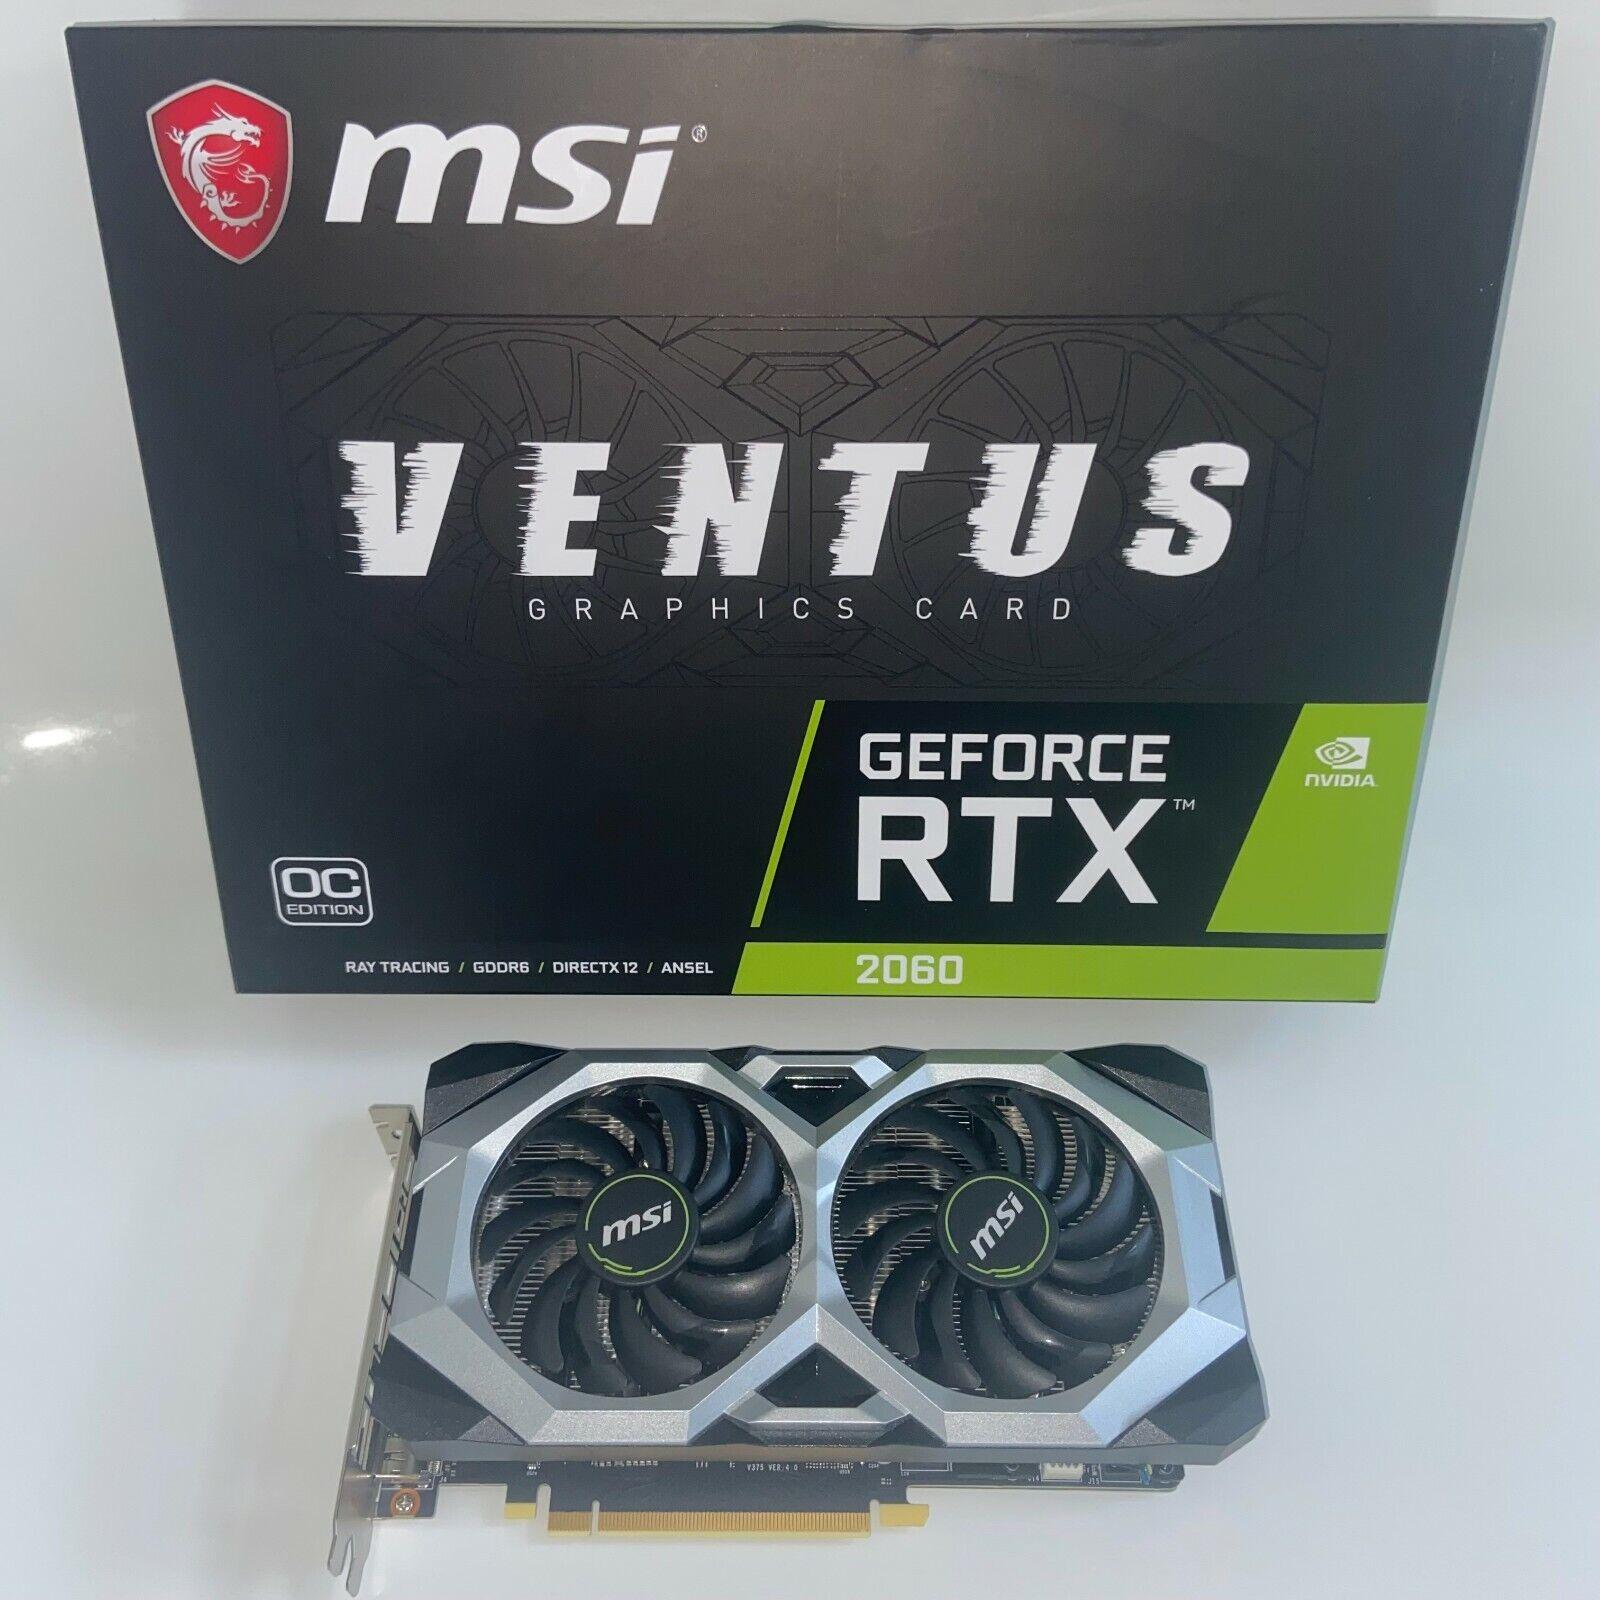 MSI GeForce RTX 2060 Ventus OC 6 Gb GDDR 6 DisplayPort Gaming Graphics Card Boxed